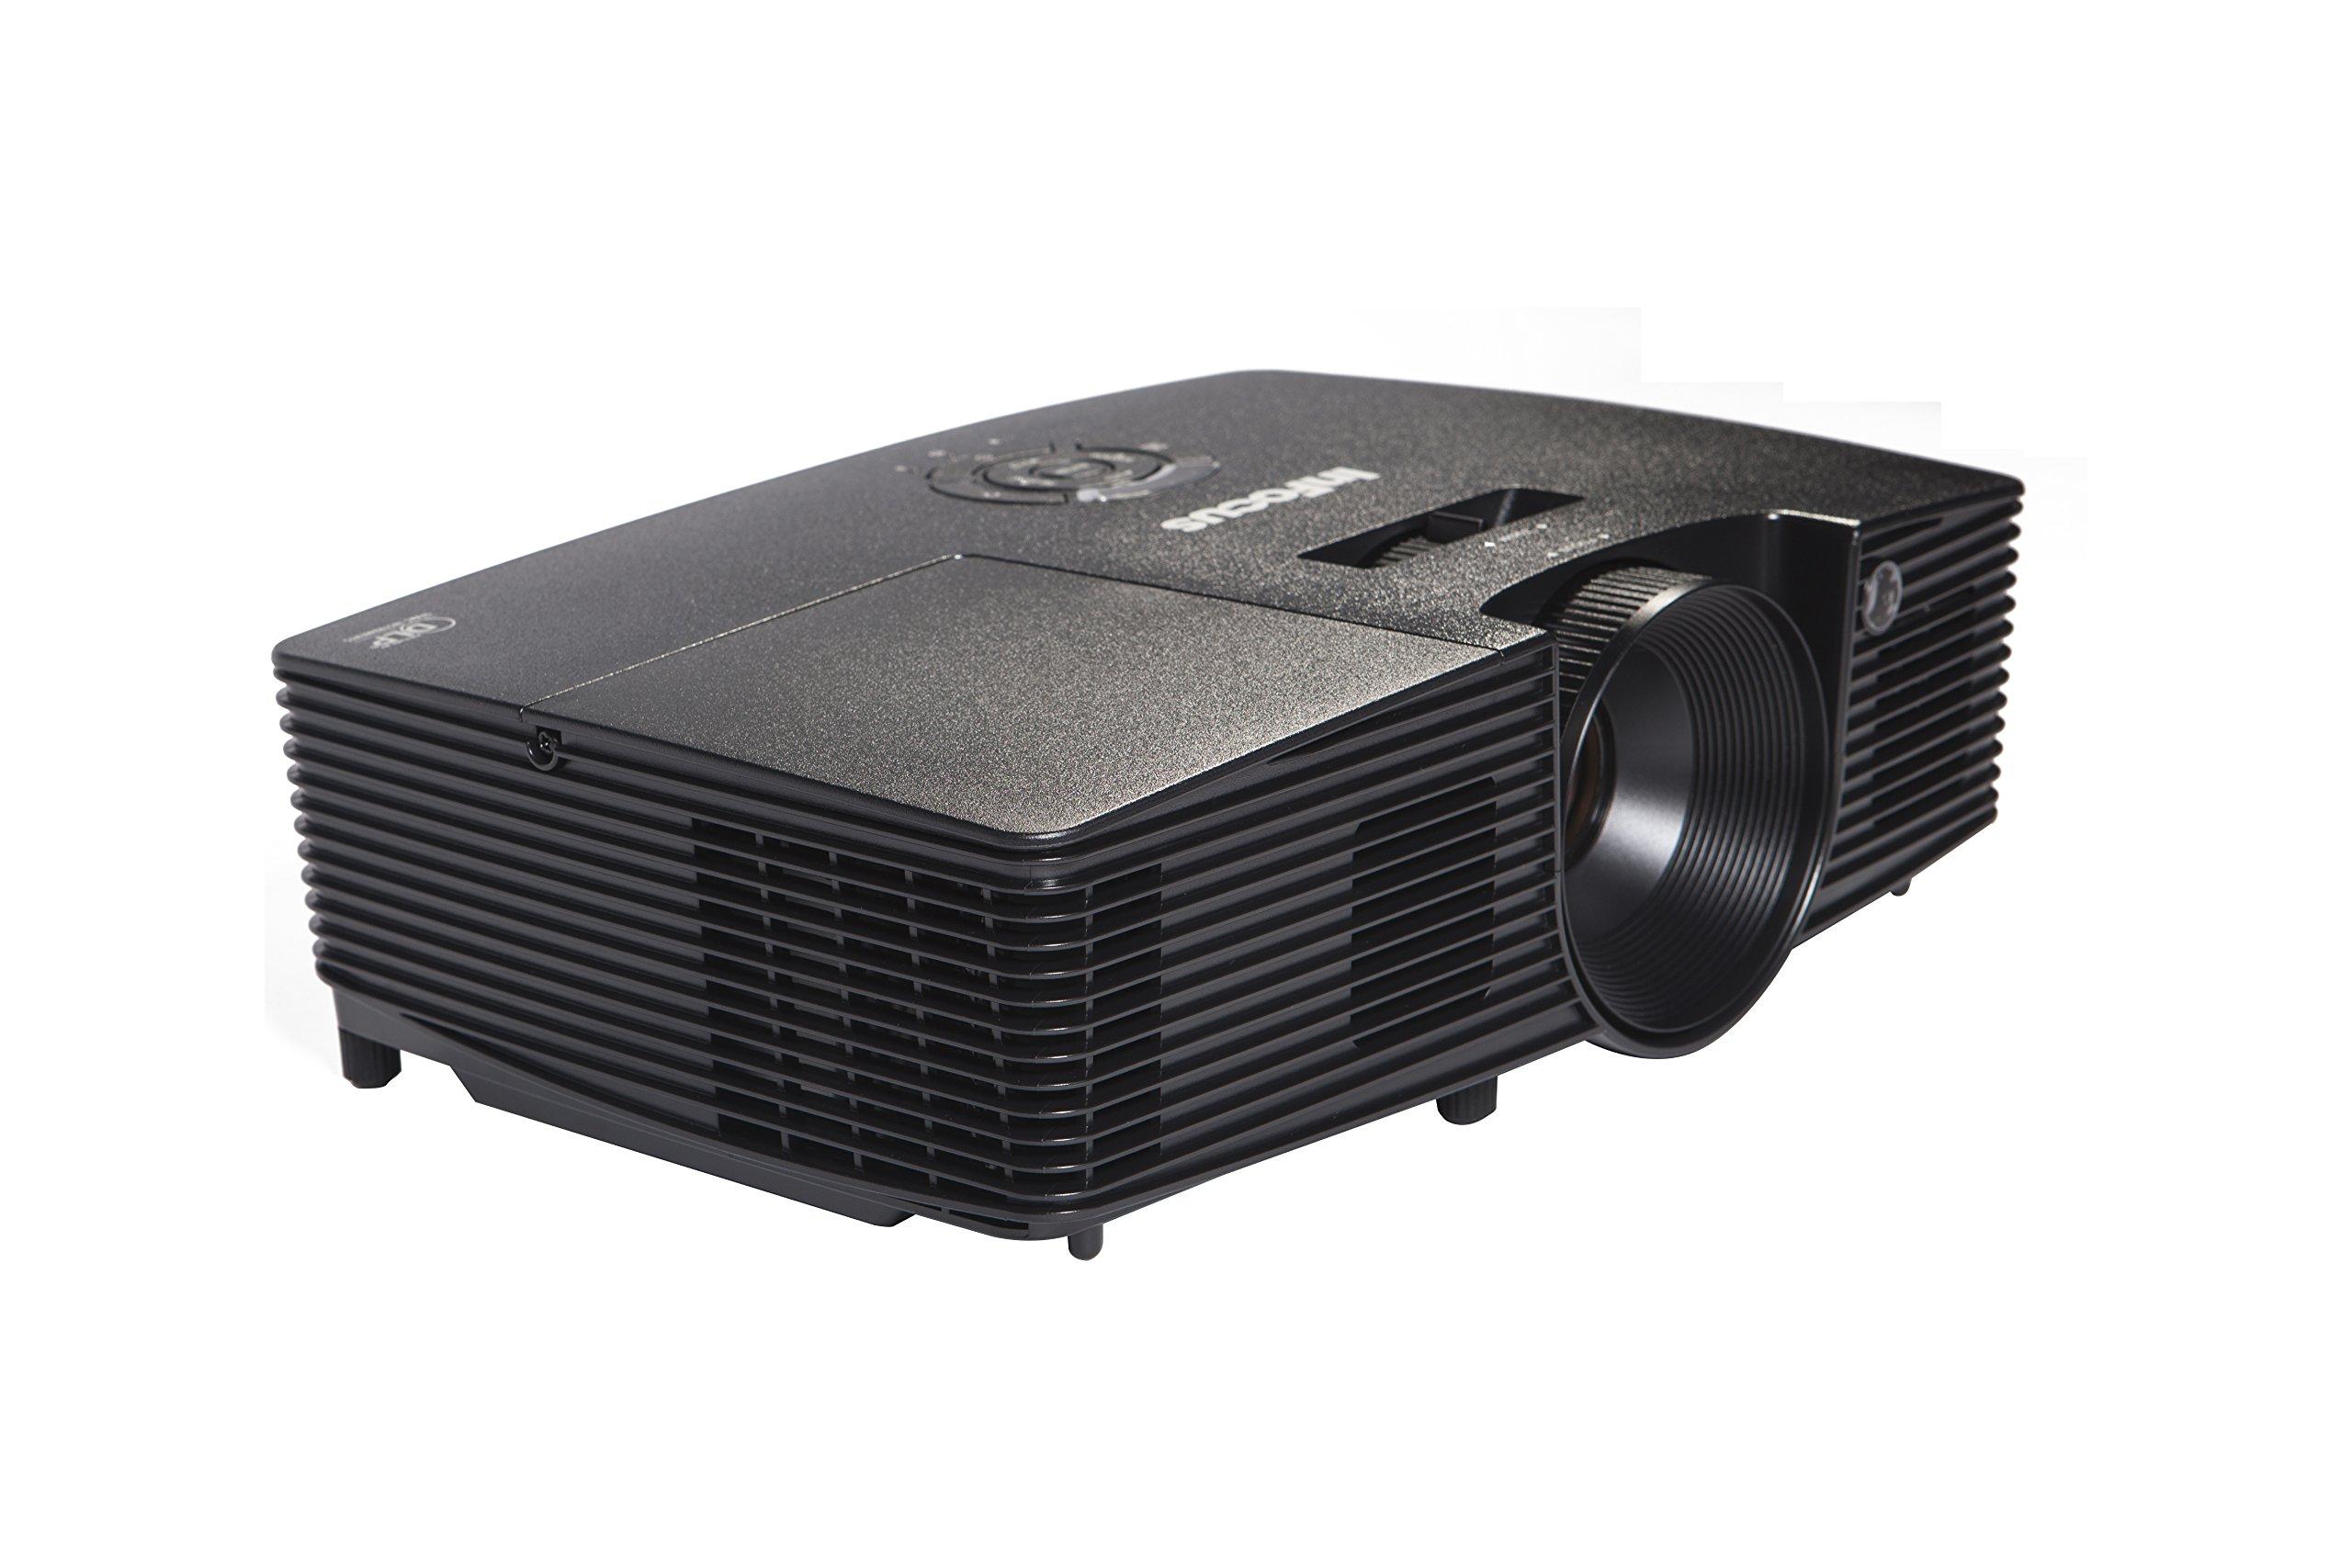 InFocus IN114XA Projector, DLP XGA 3600 Lumens 3D Ready 2HDMI With Speakers